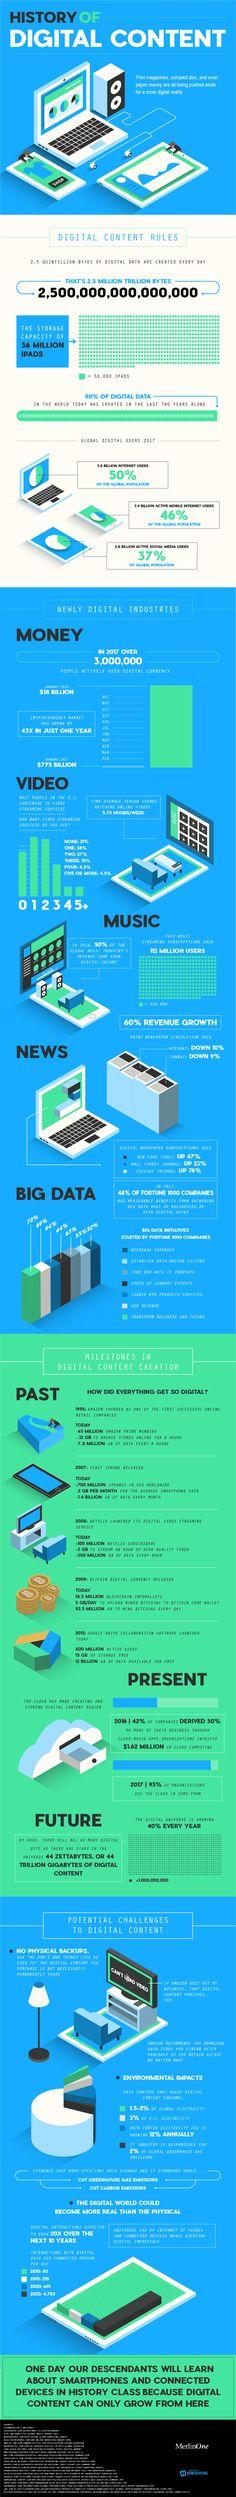 History of #Digital #Content // La historia del contenido digital.